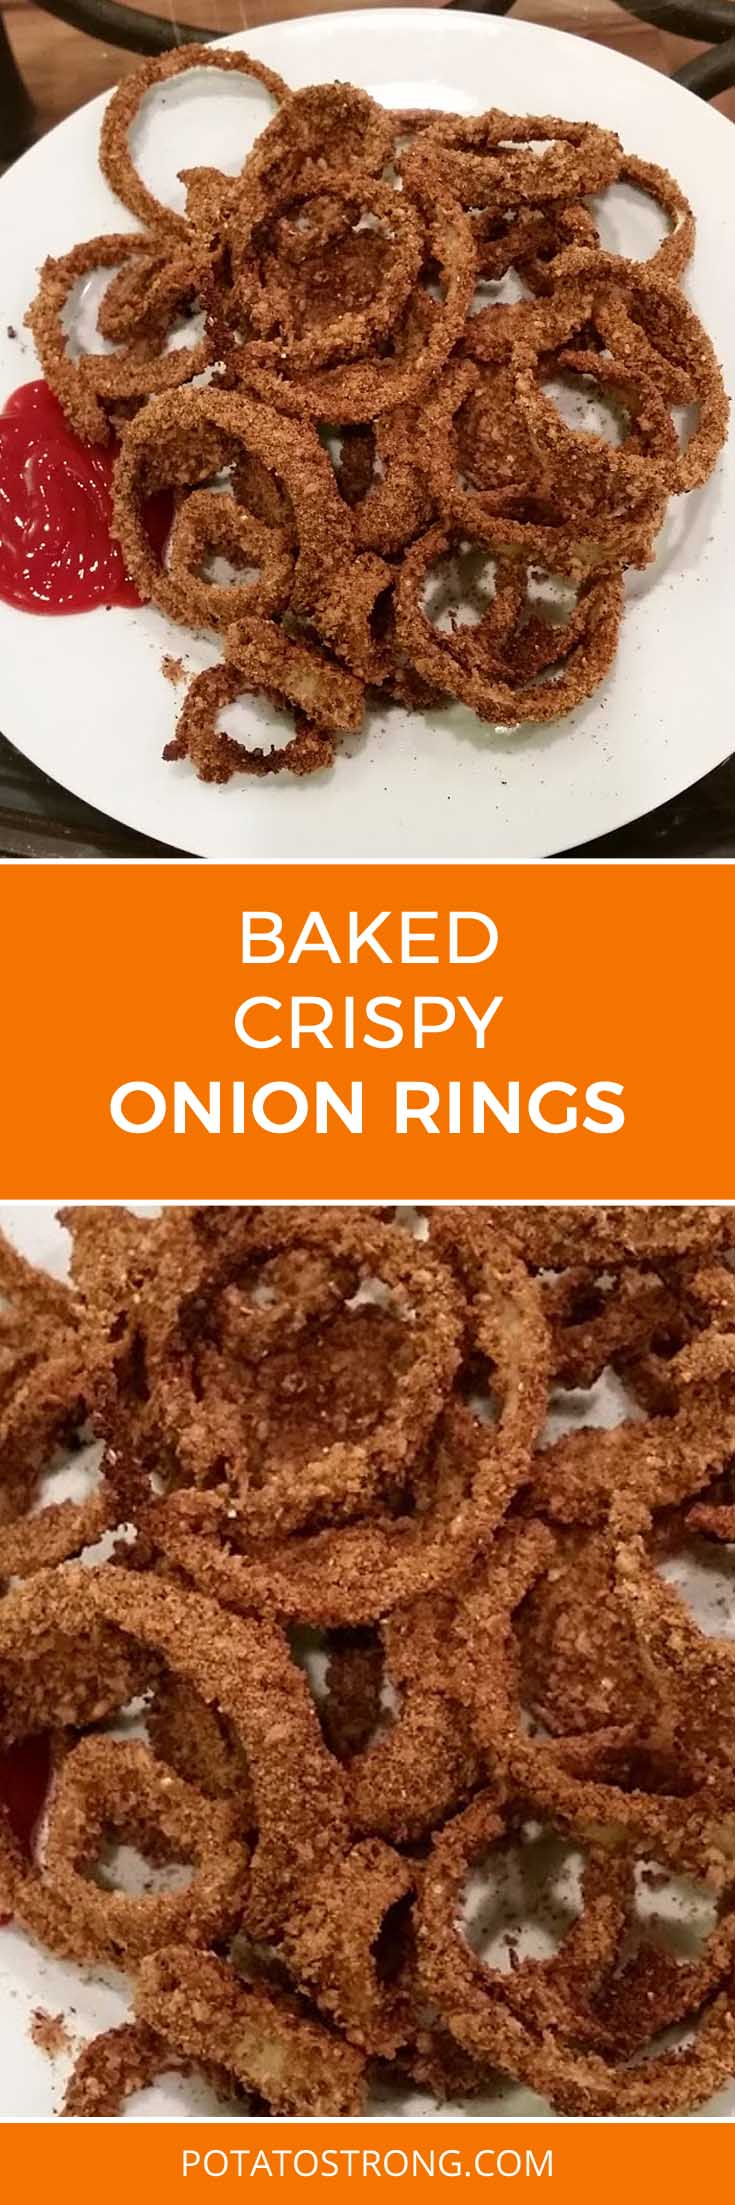 Baked, crispy no oil onion rings - Potato Strong